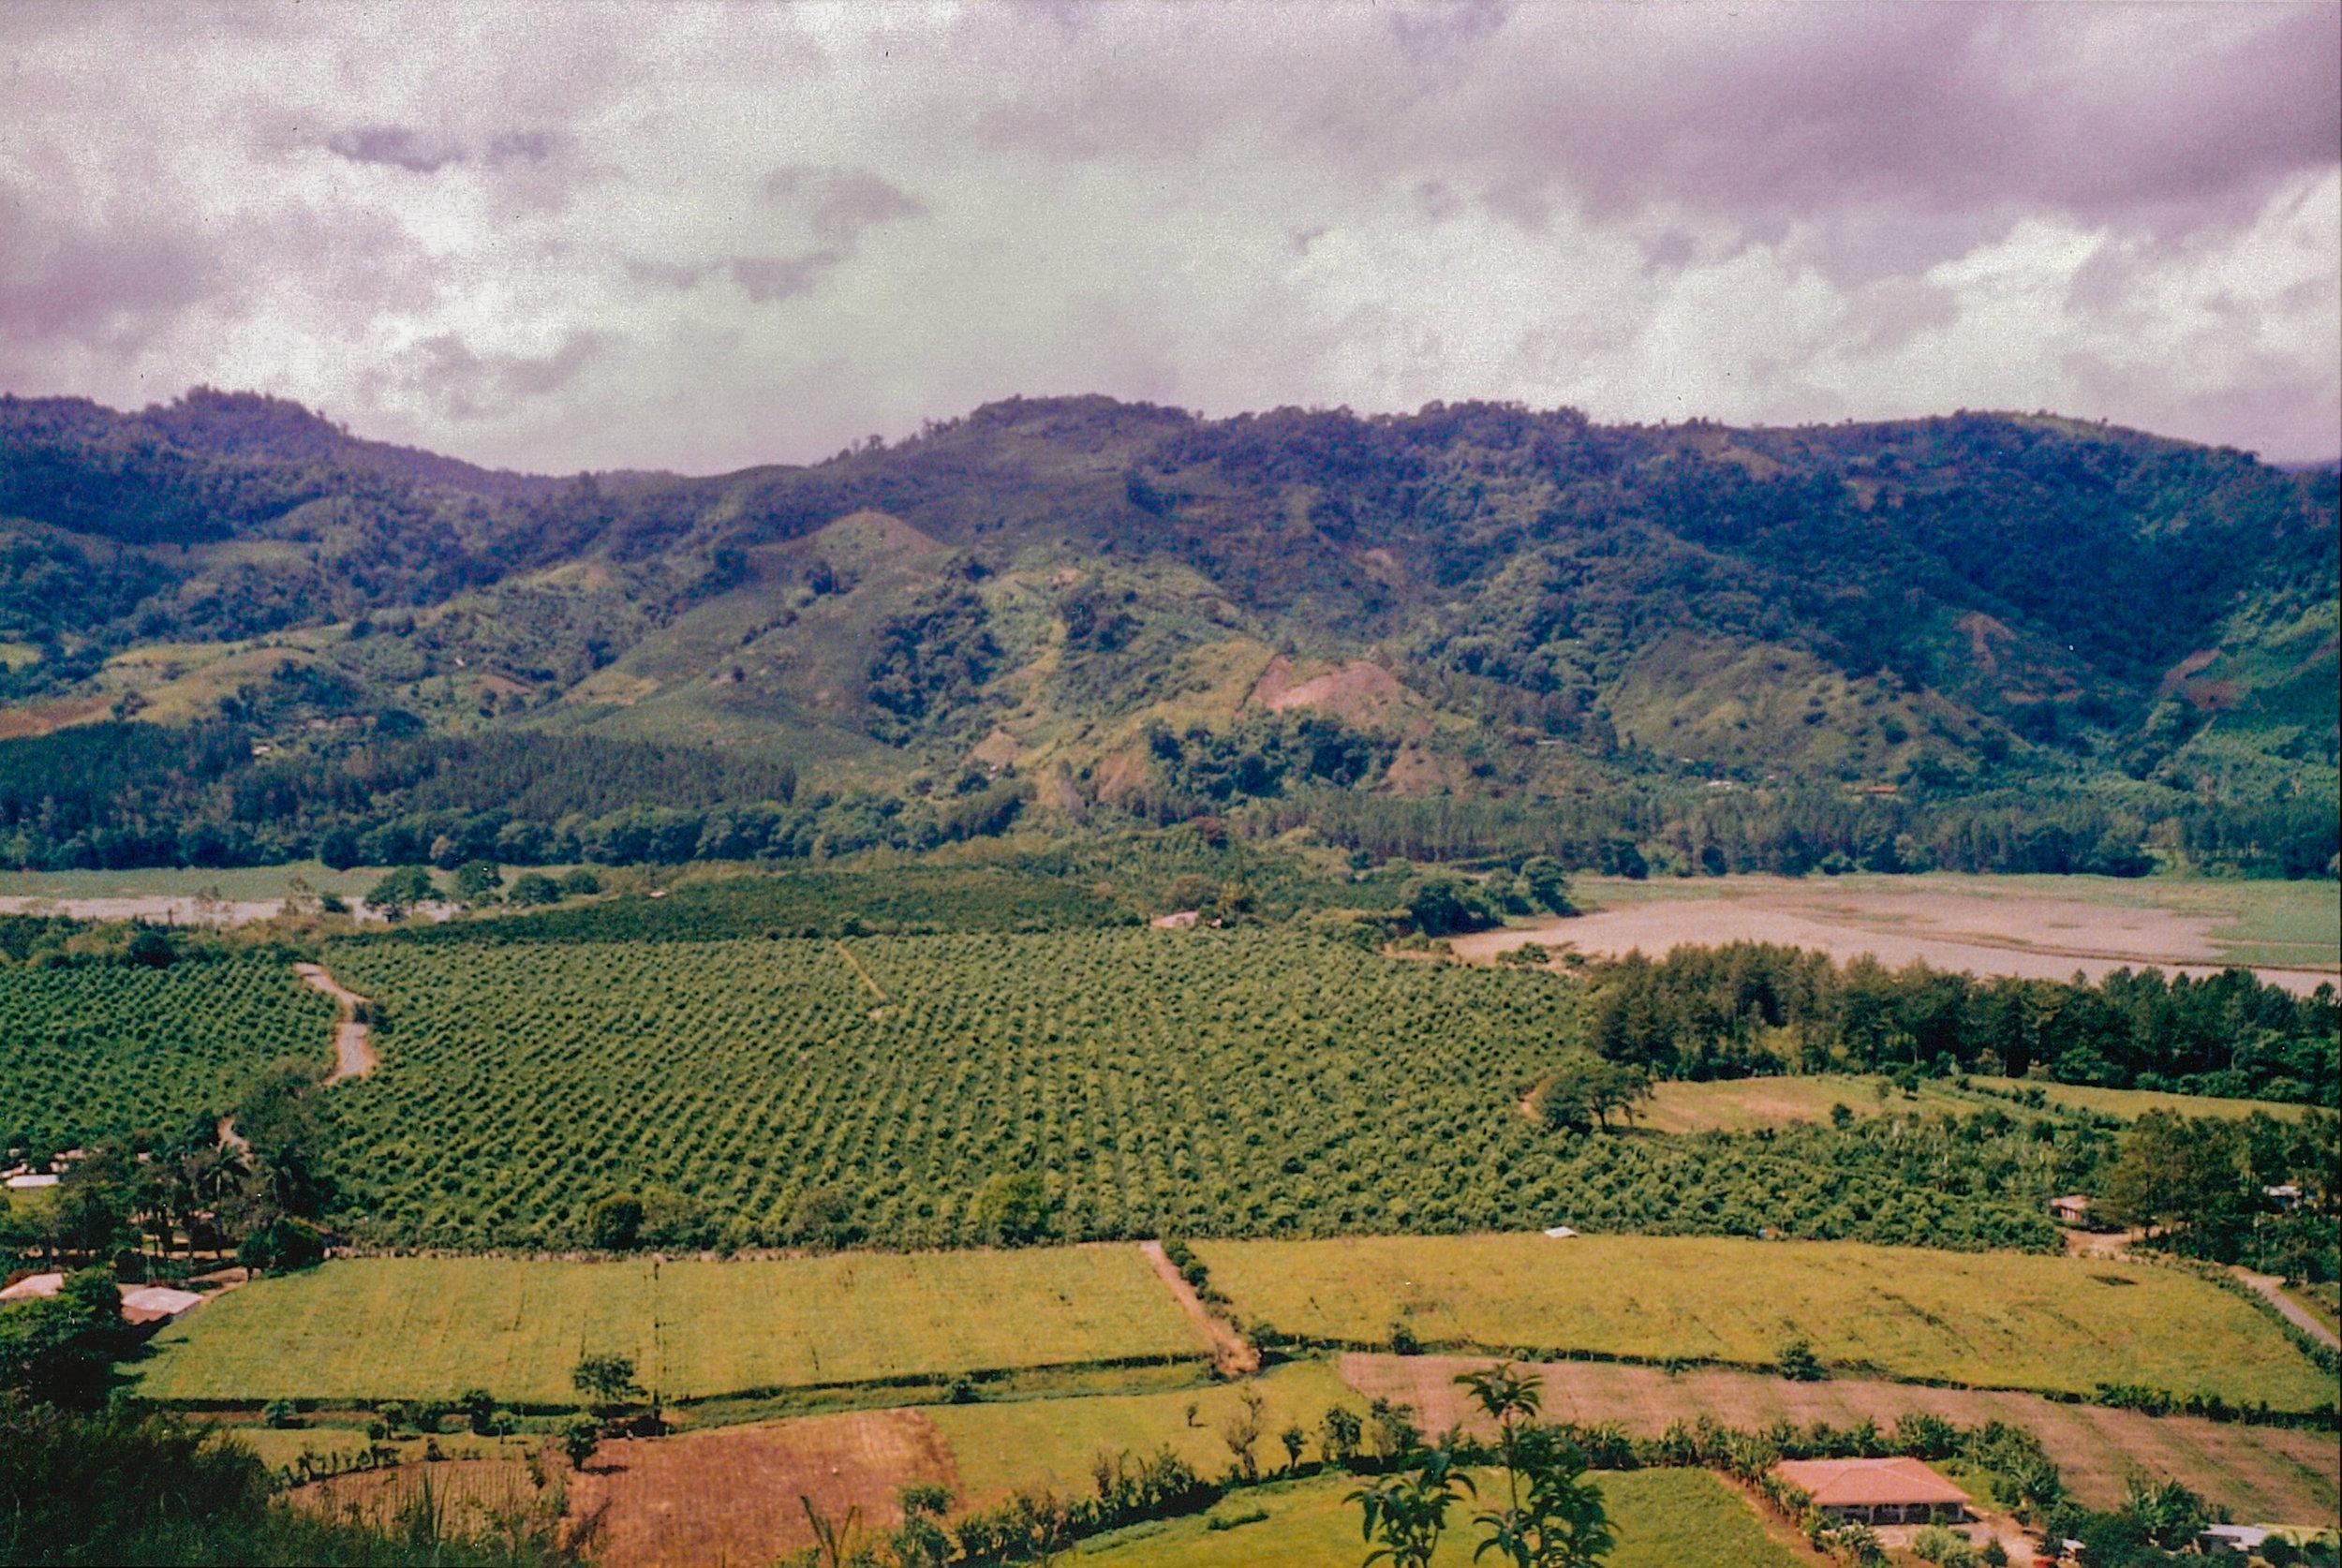 Costa Rica 1999 (1 of 9).jpg